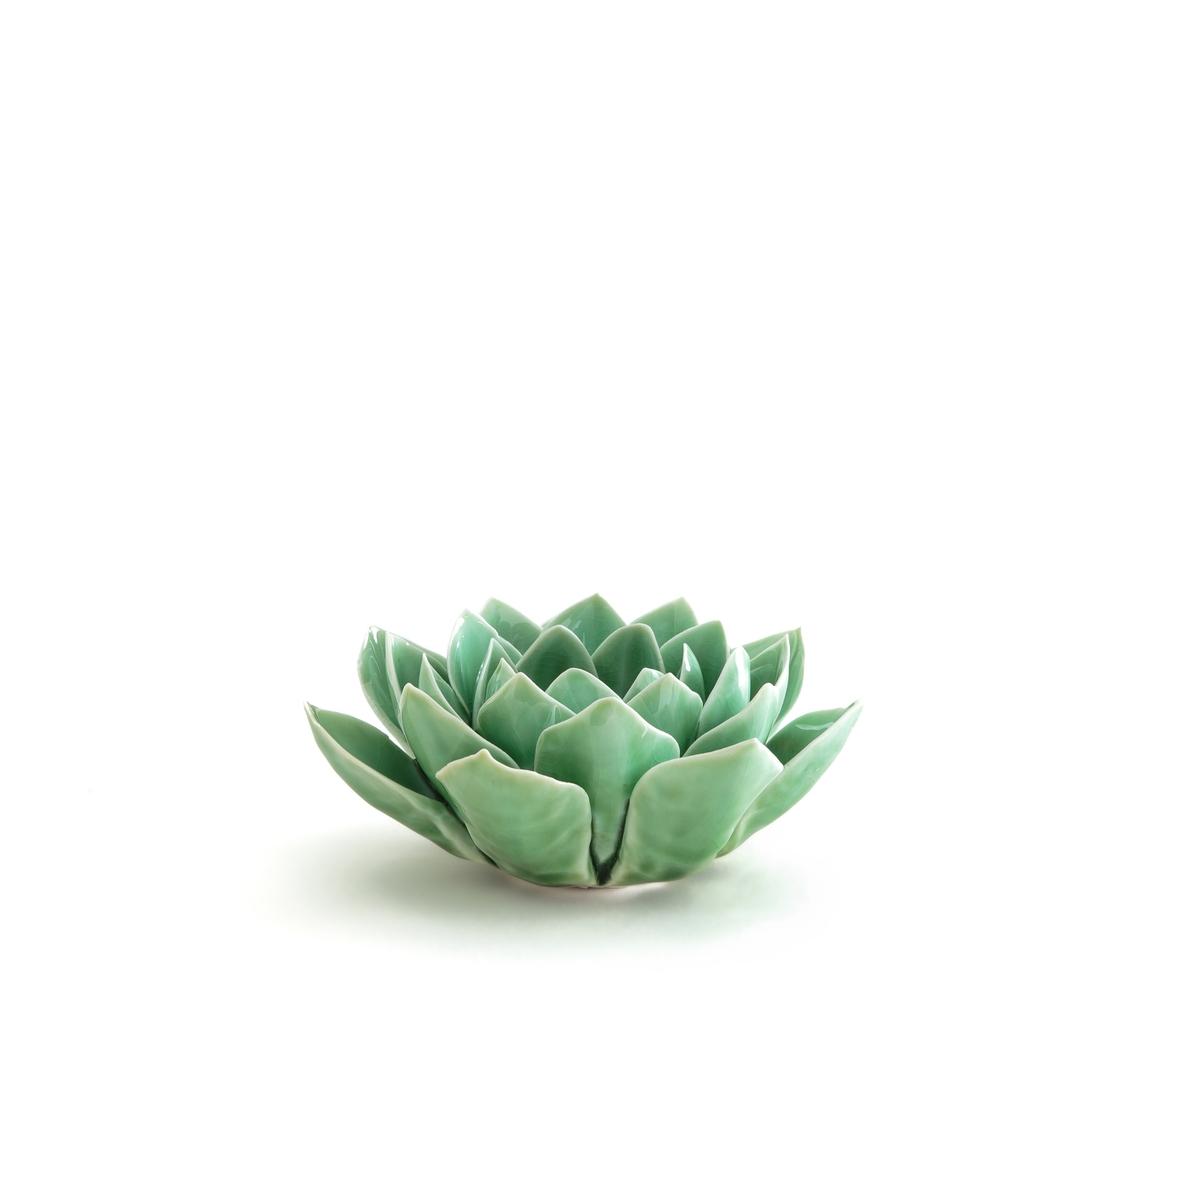 Porta candela ceramica mod. 2 Agave